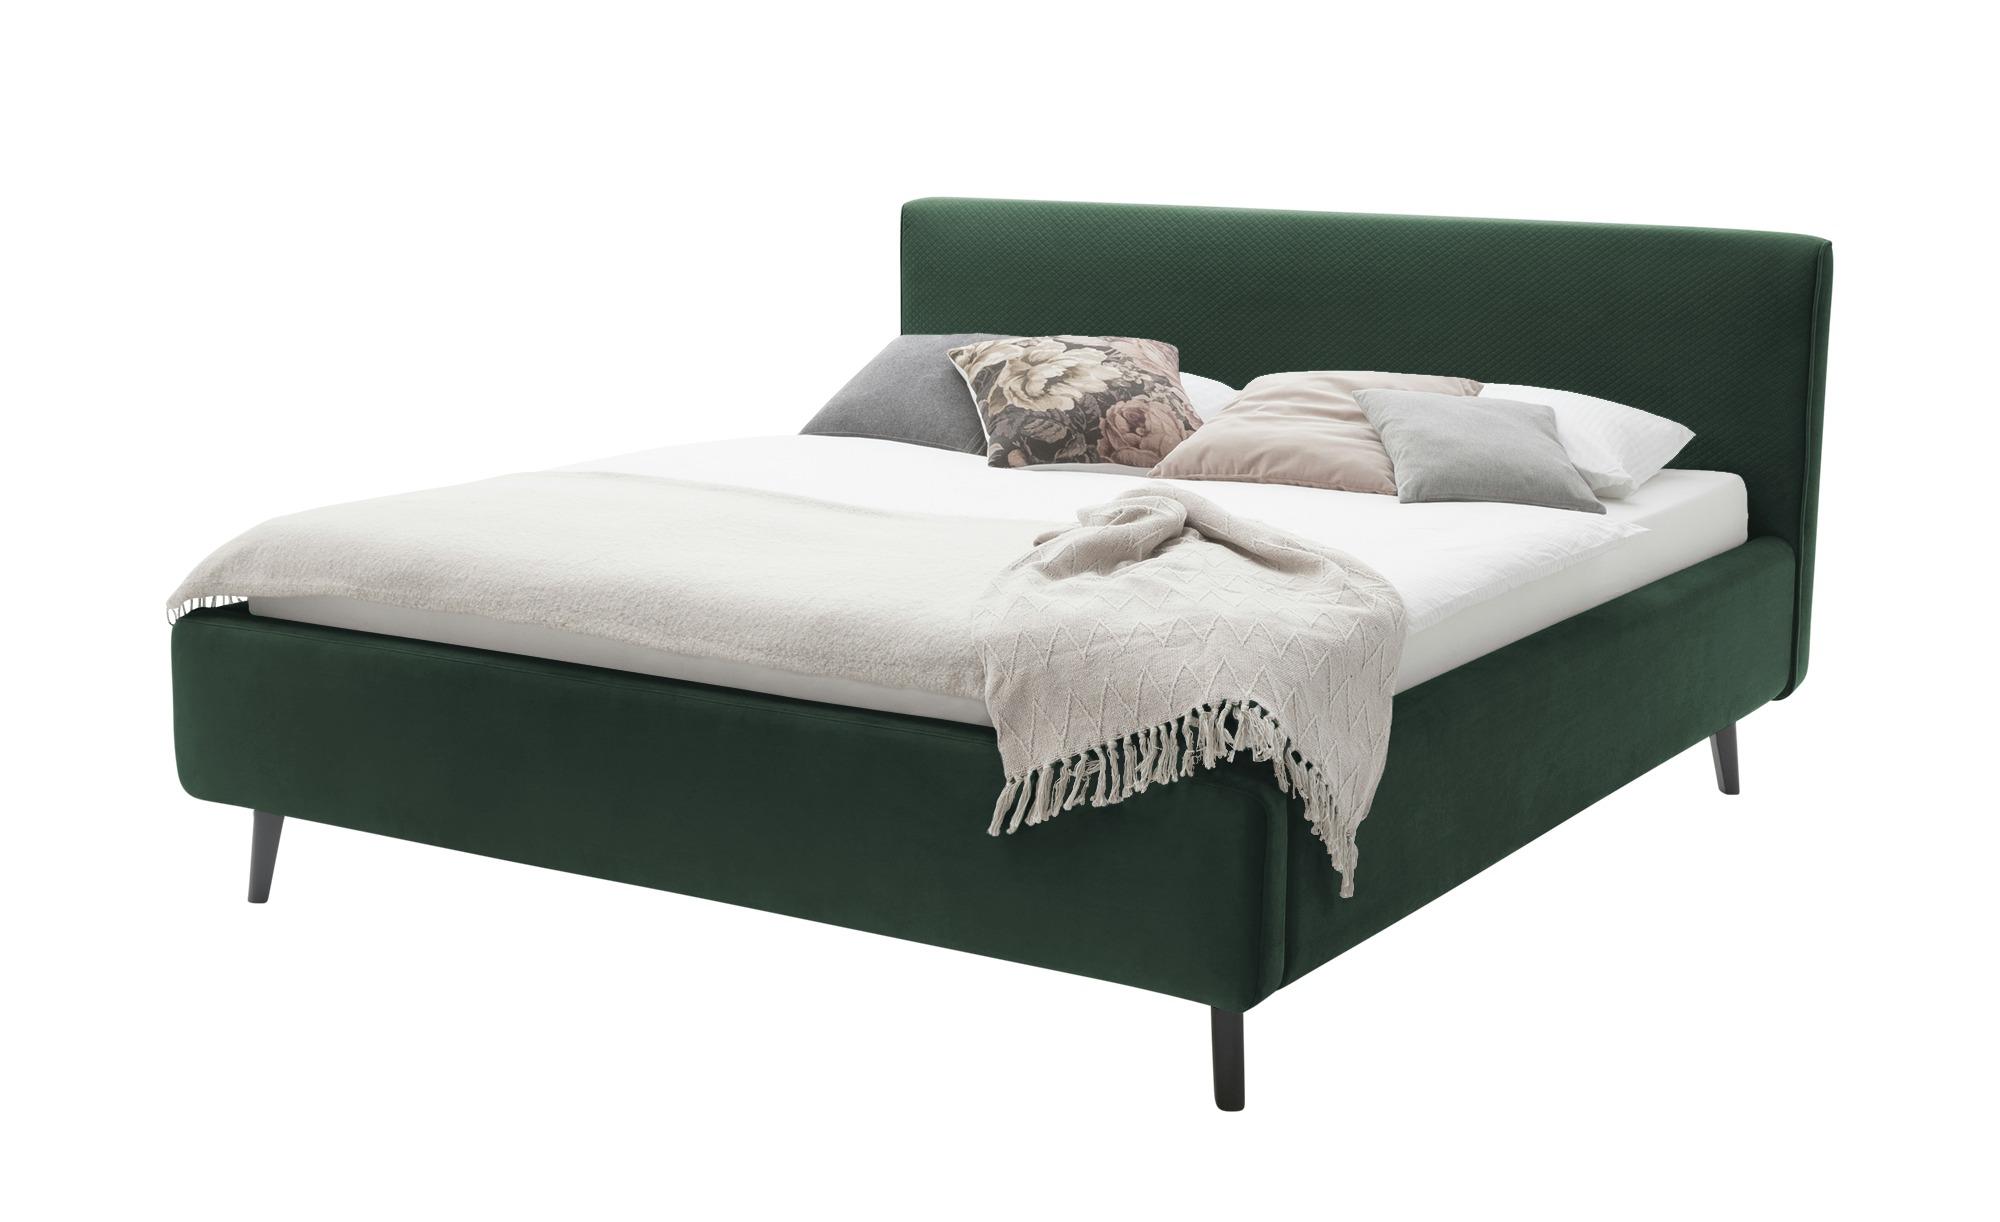 Polsterbett  Lewisham ¦ grün ¦ Maße (cm): B: 181 H: 222 T: 105 Betten > Polsterbetten - Höffner